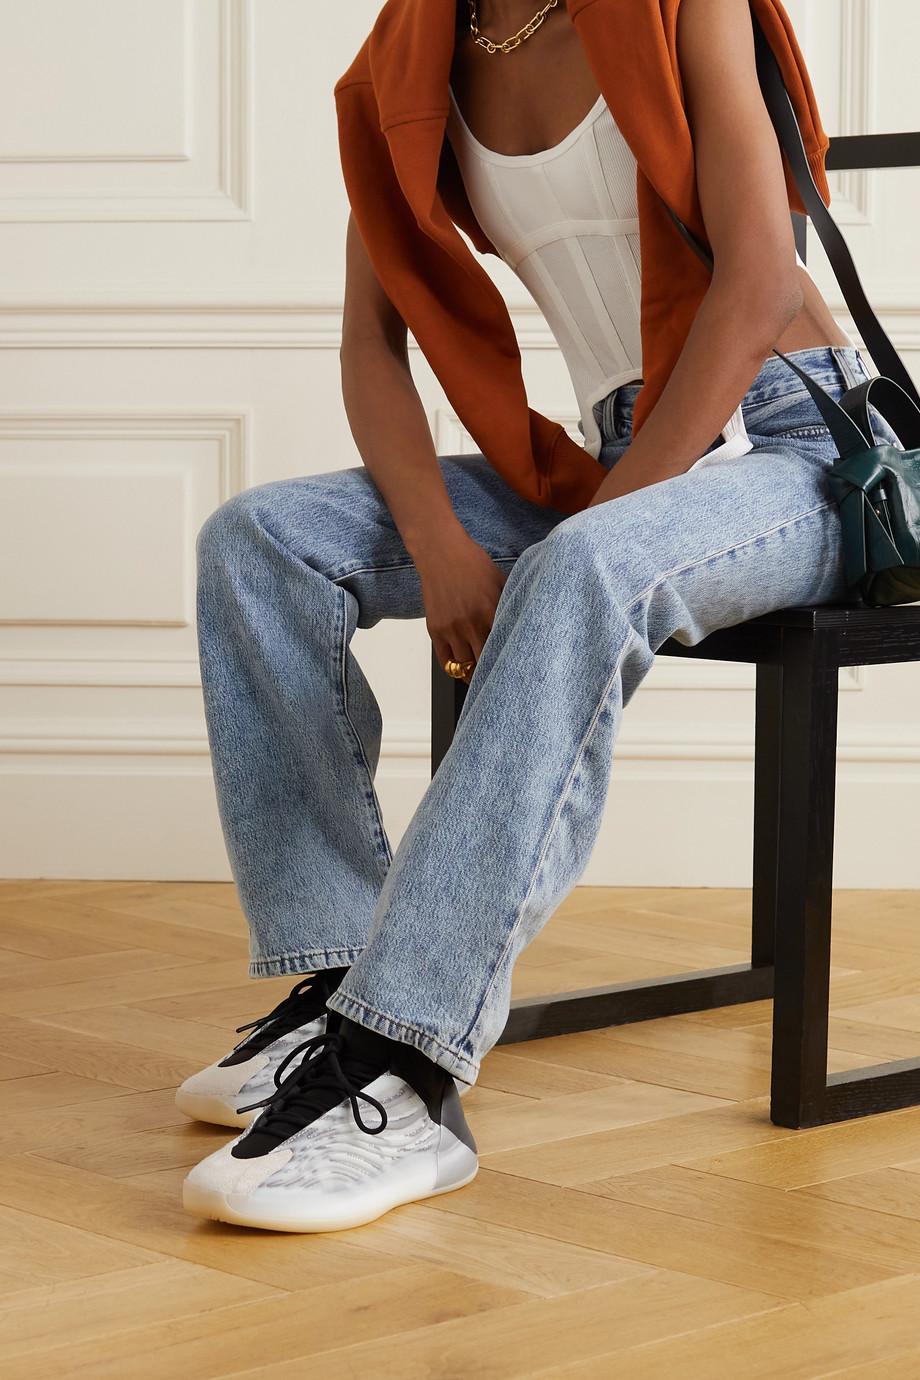 adidas Originals Yeezy Quantum Sneakers aus Primeknit und Neopren mit Velourslederbesatz